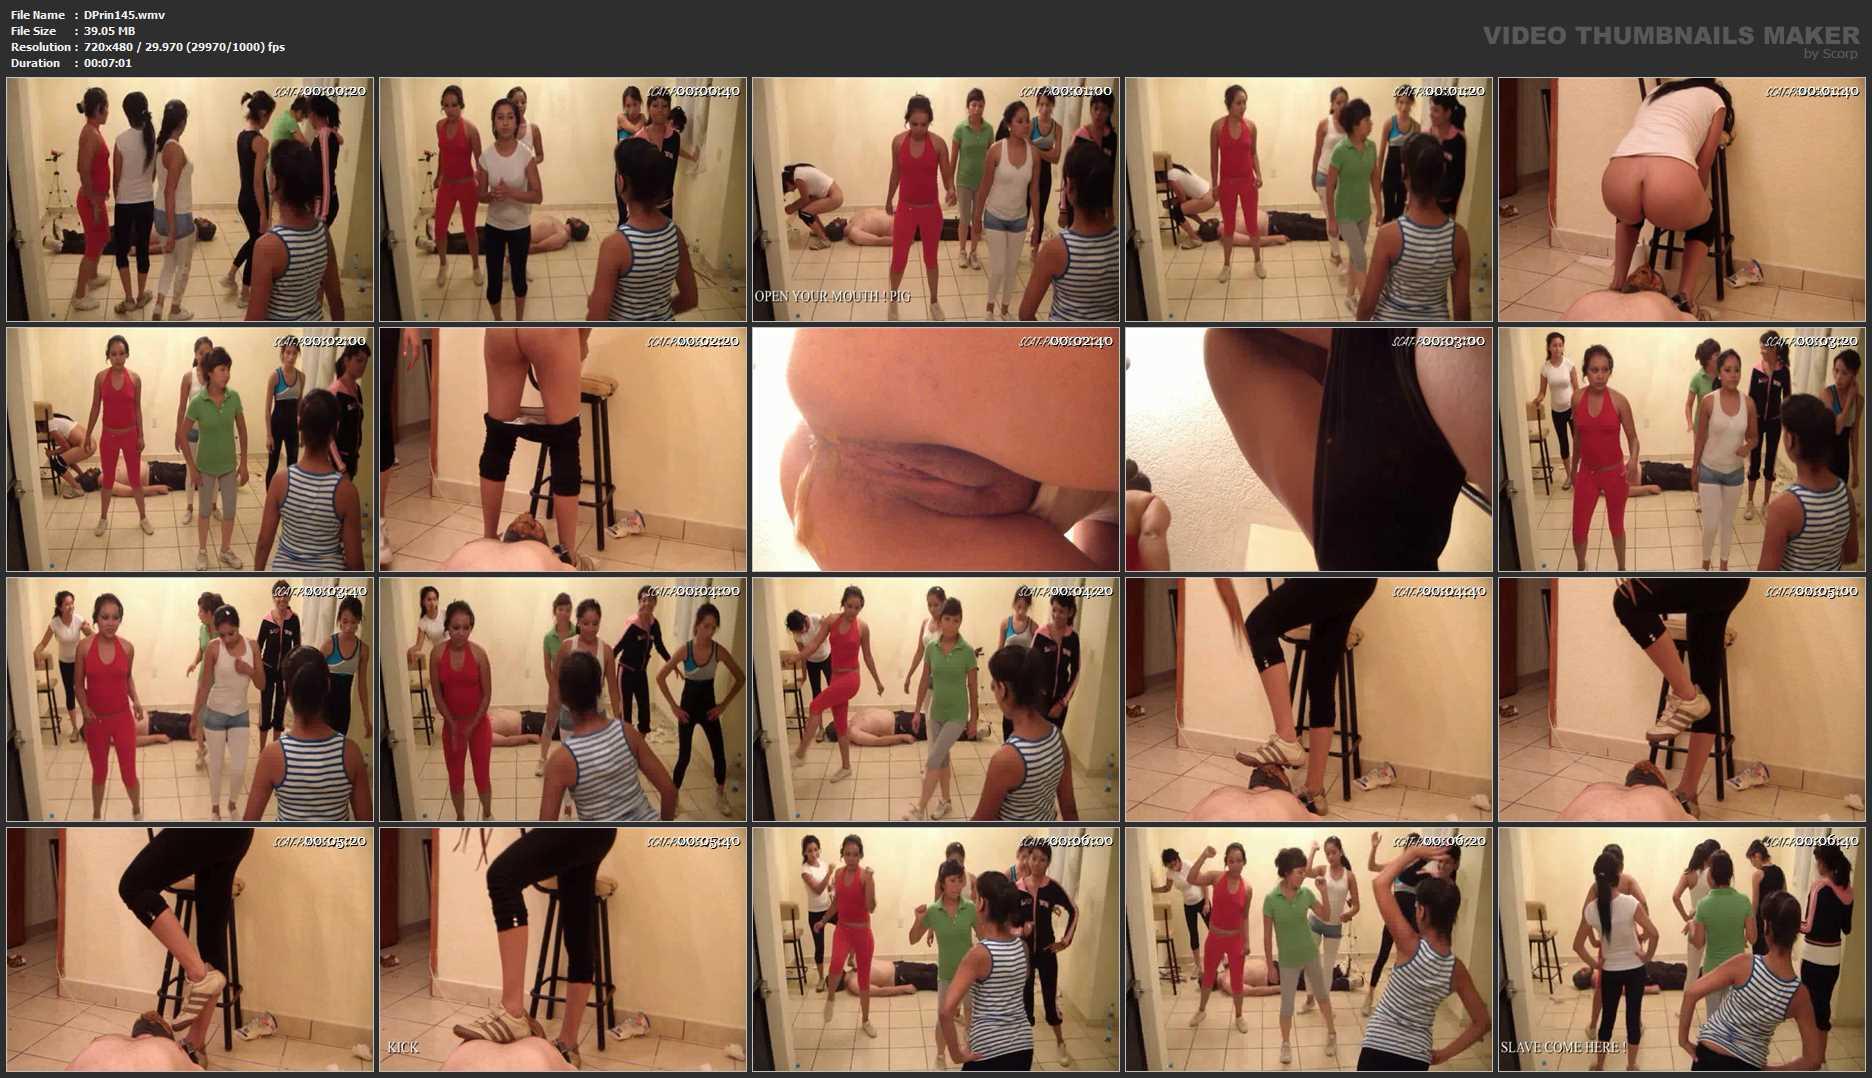 [DOM-PRINCESS] Toilet Slaves Aerobic Lessons Part 3 M [SD][480p][WMV]